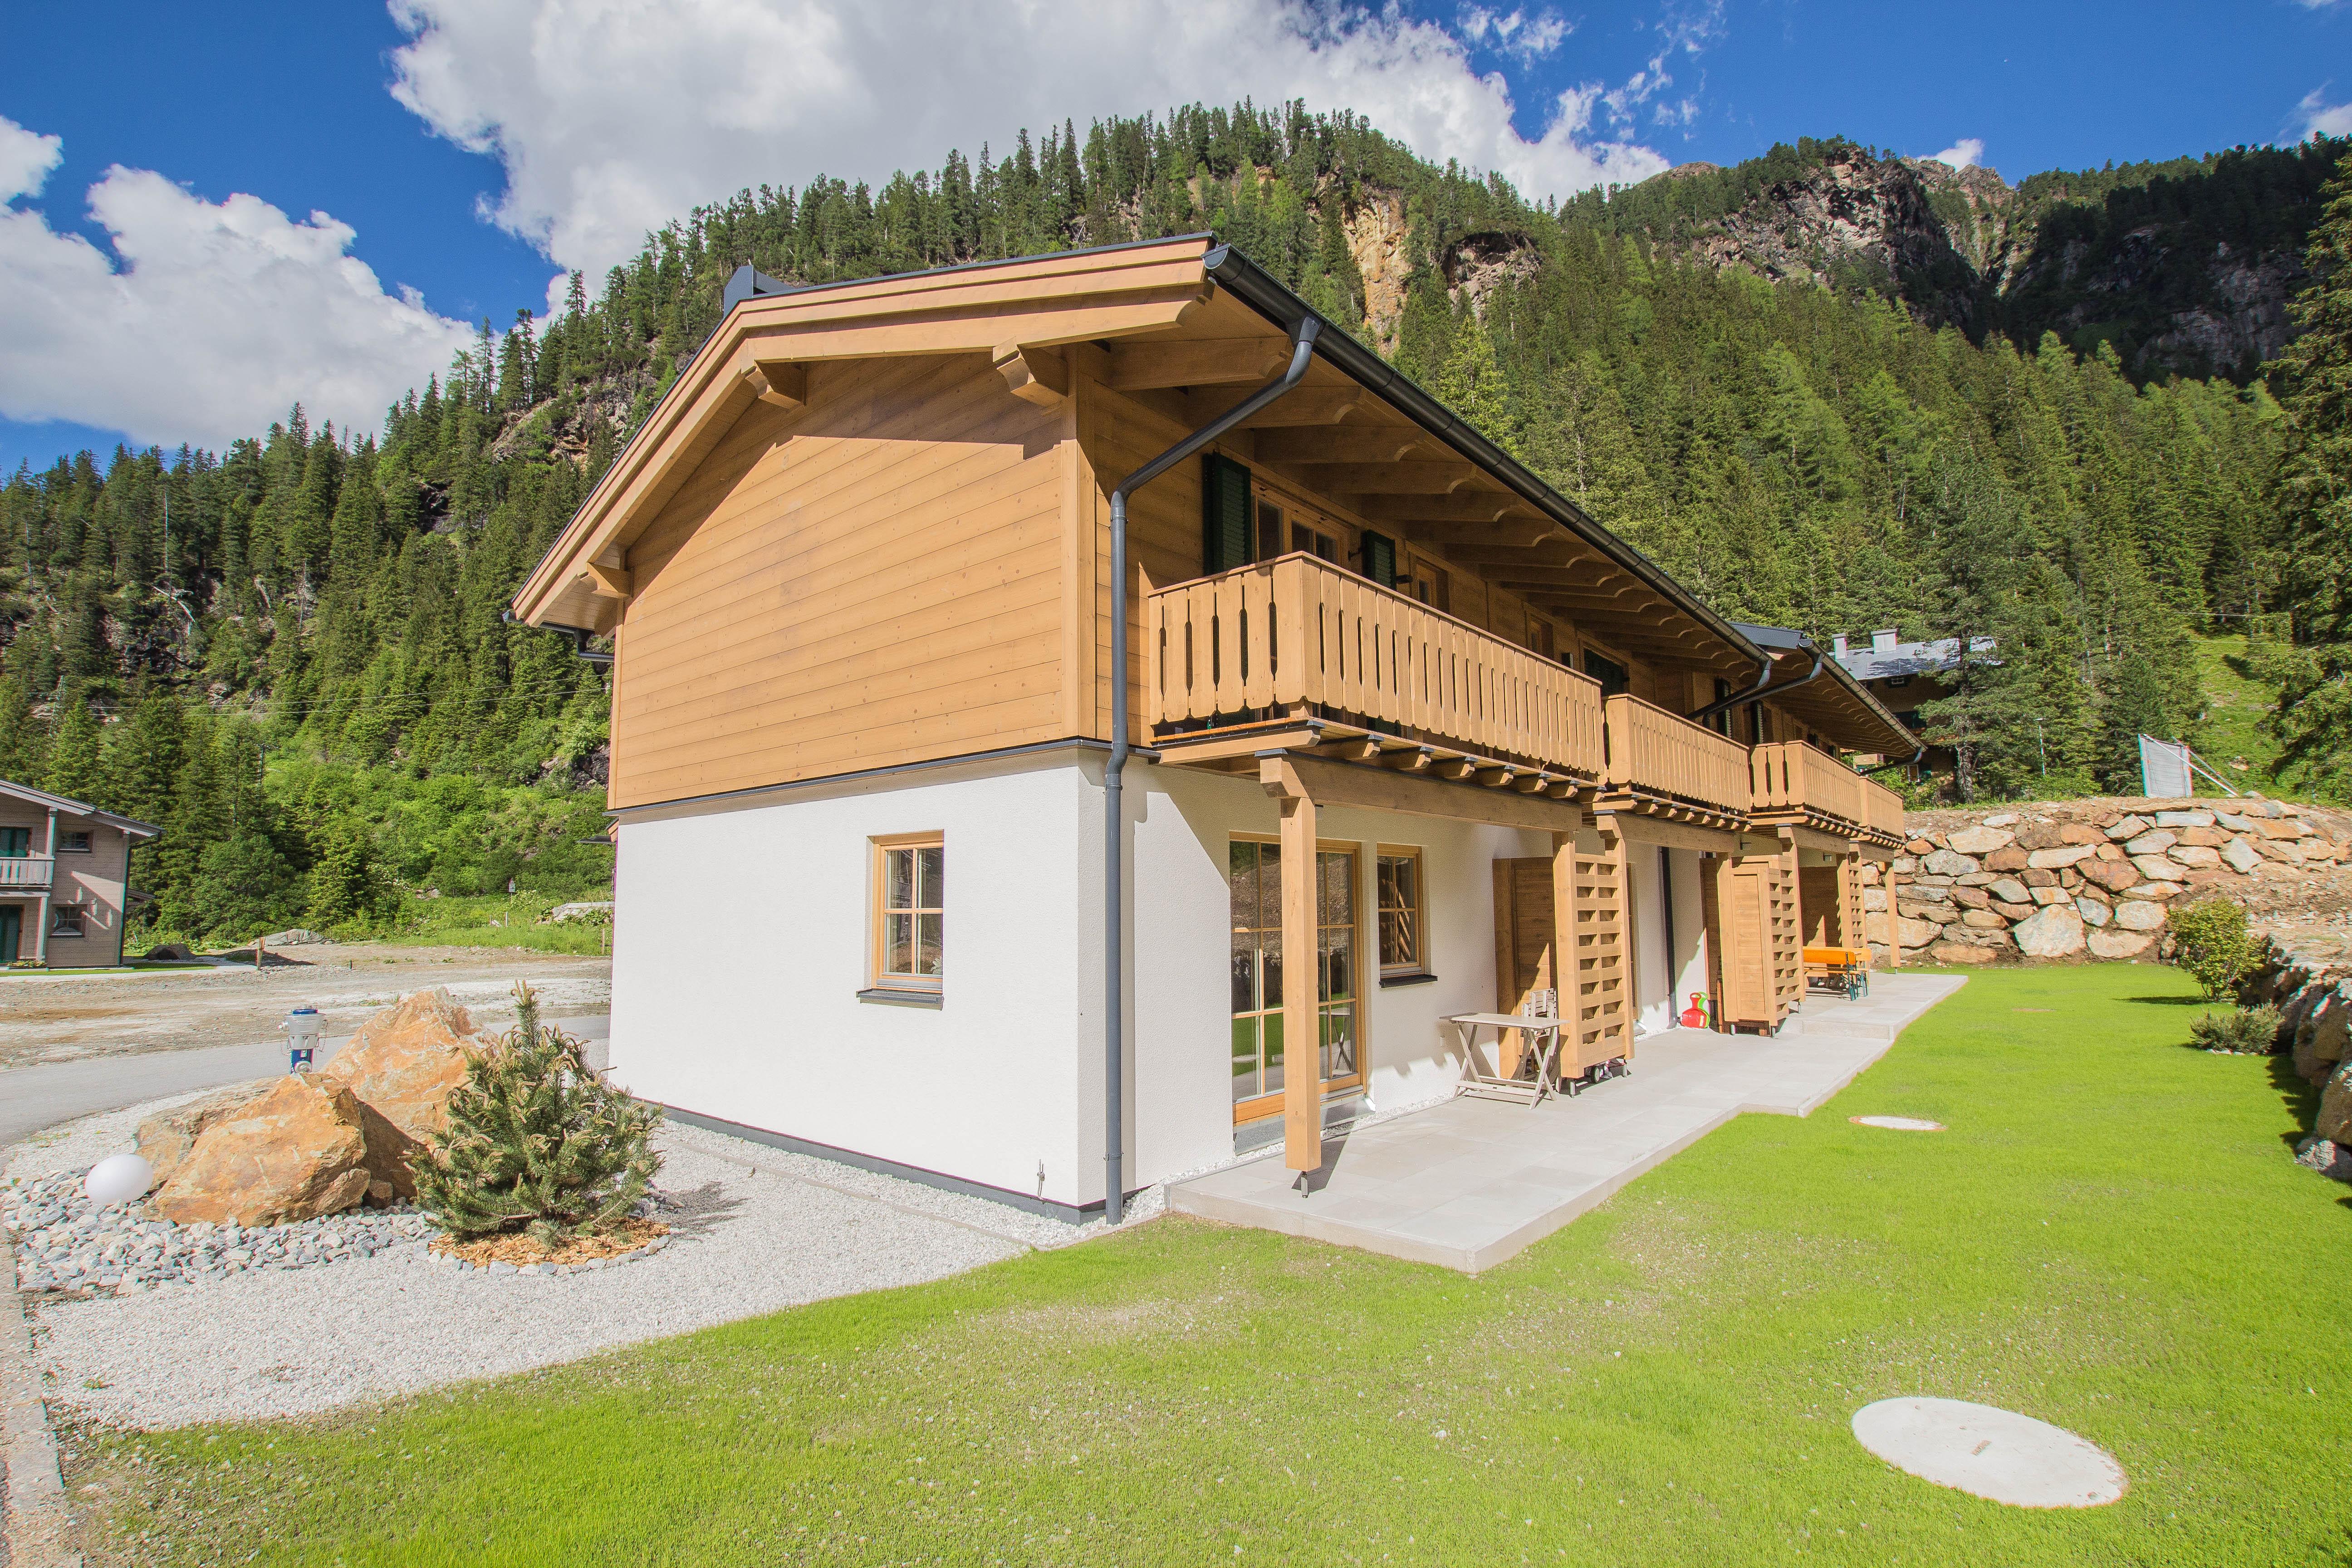 Maison de vacances Lodge Kleiner Bär direkt am Skilift (2050394), Uttendorf, Pinzgau, Salzbourg, Autriche, image 25